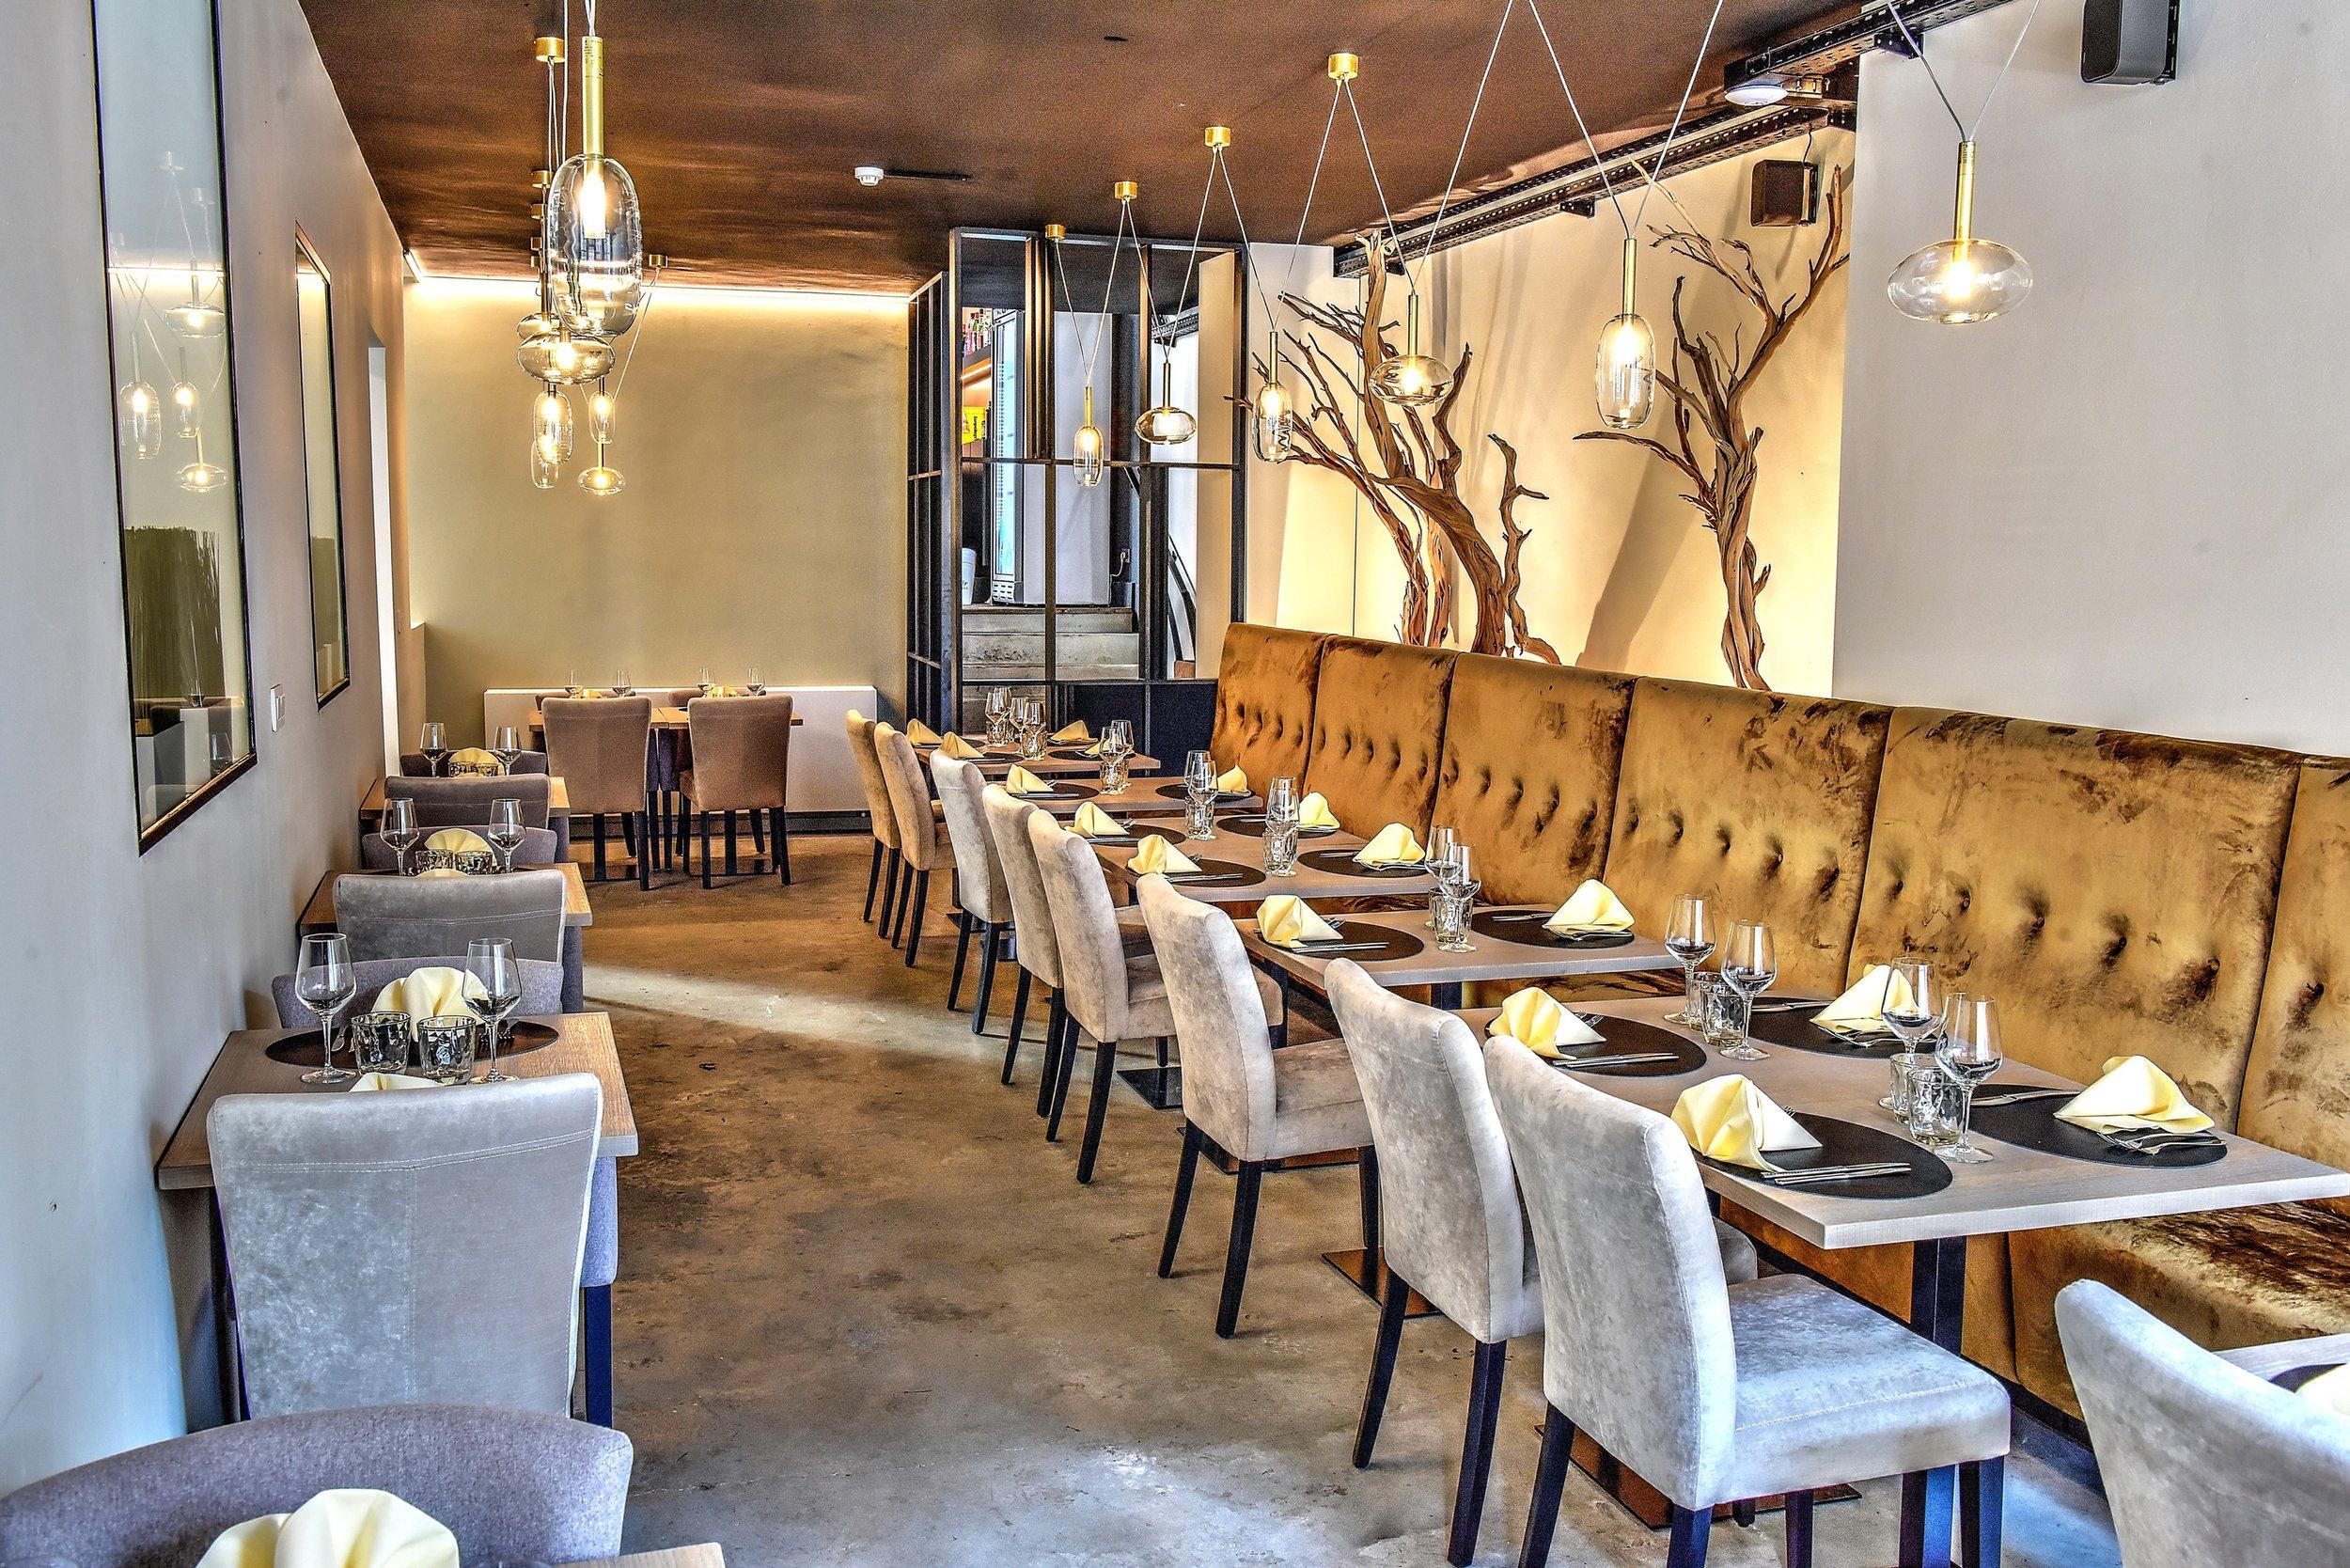 7 italiaans restaurant gent l incontro lincontro.jpg.jpg.jpg.jpg.jpg